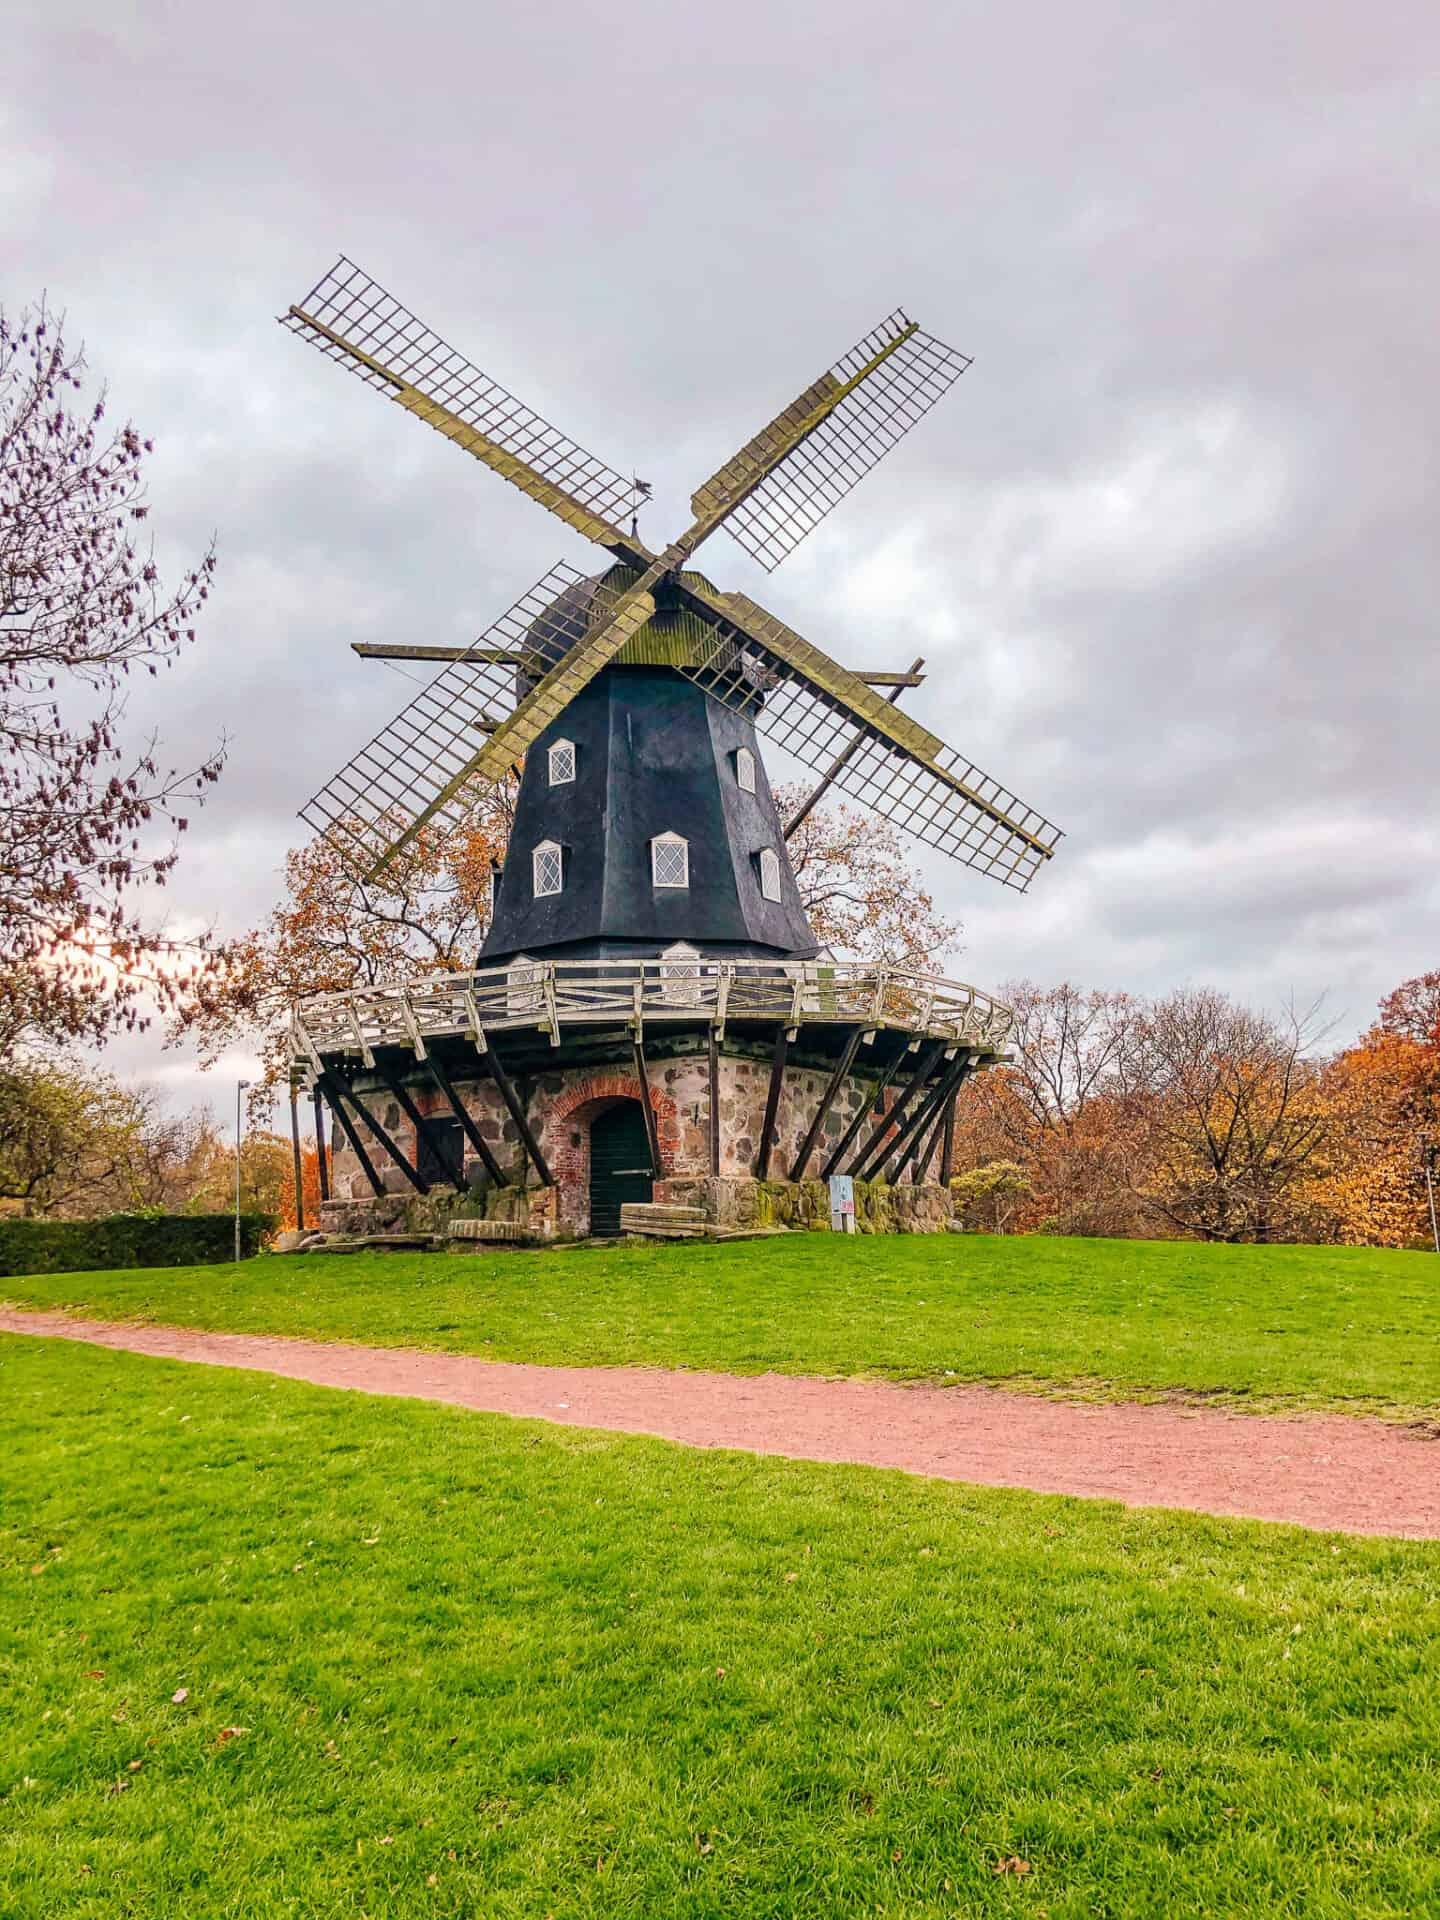 Blue windmill standing in green grass